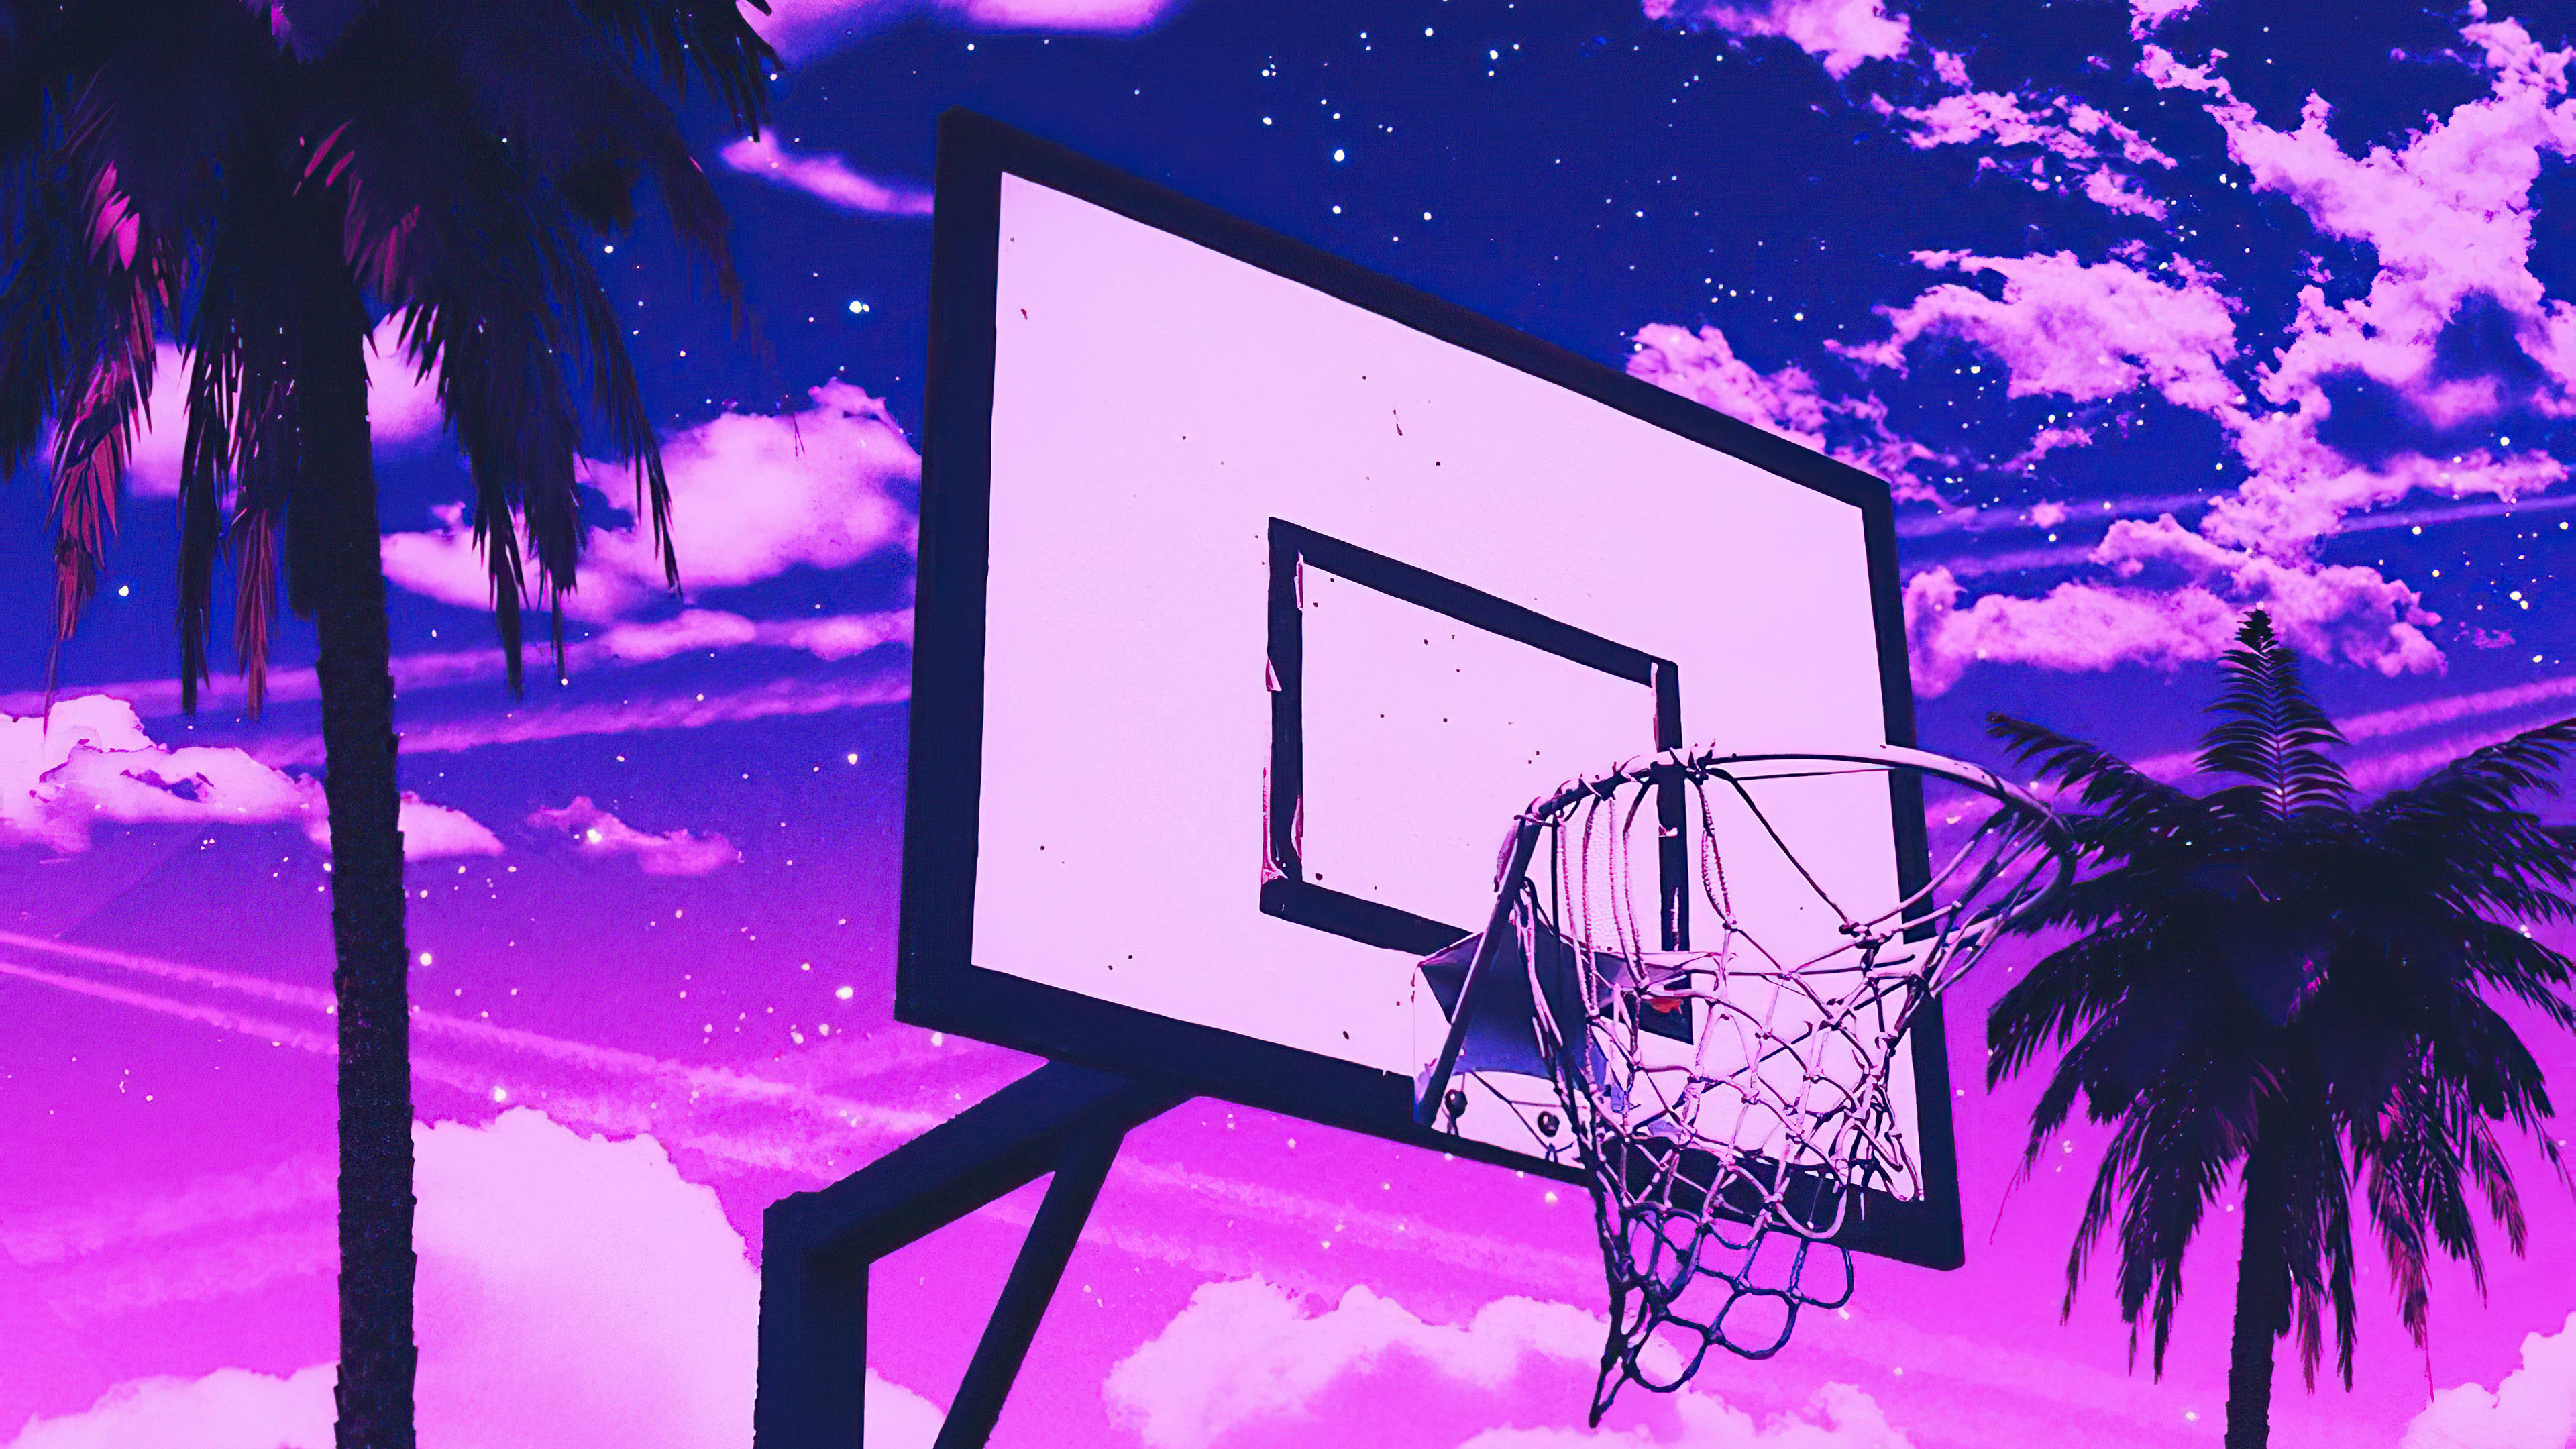 Basketball Court 4k Hd Artist 4k Wallpapers Images Backgrounds